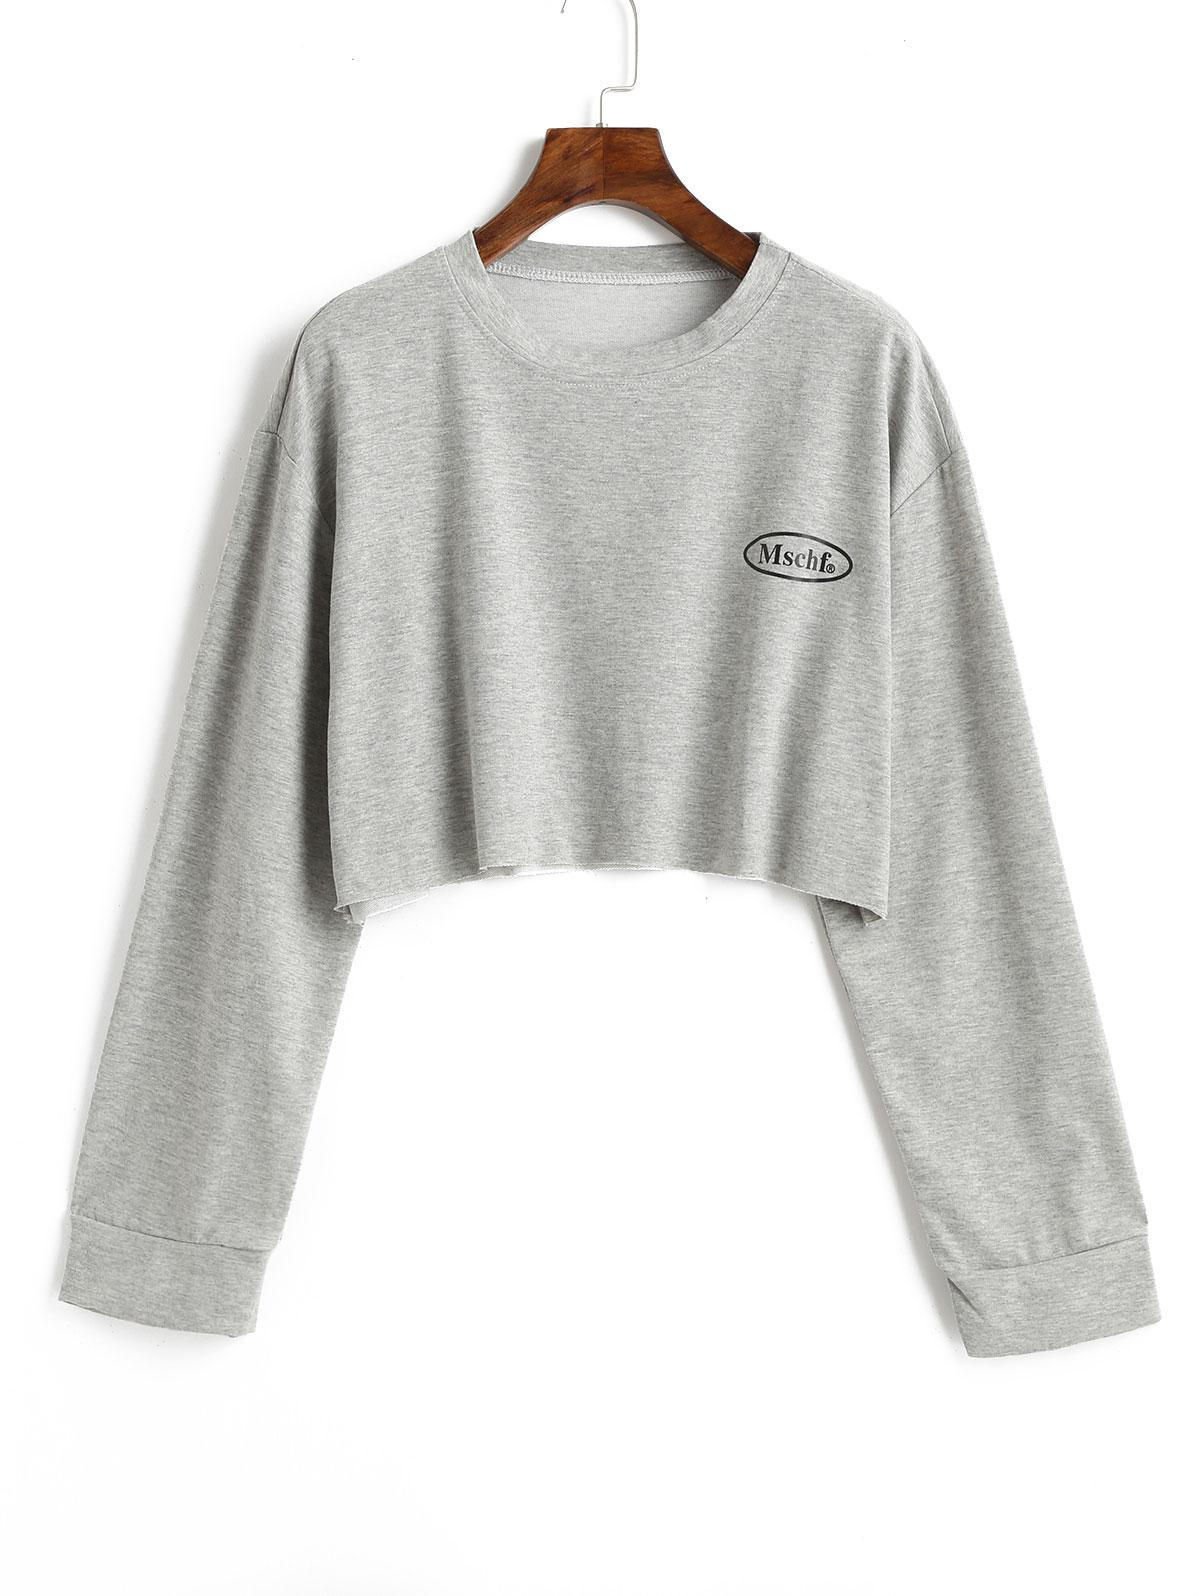 Letter Print Drop Shoulder Cropped Sweatshirt, Light gray